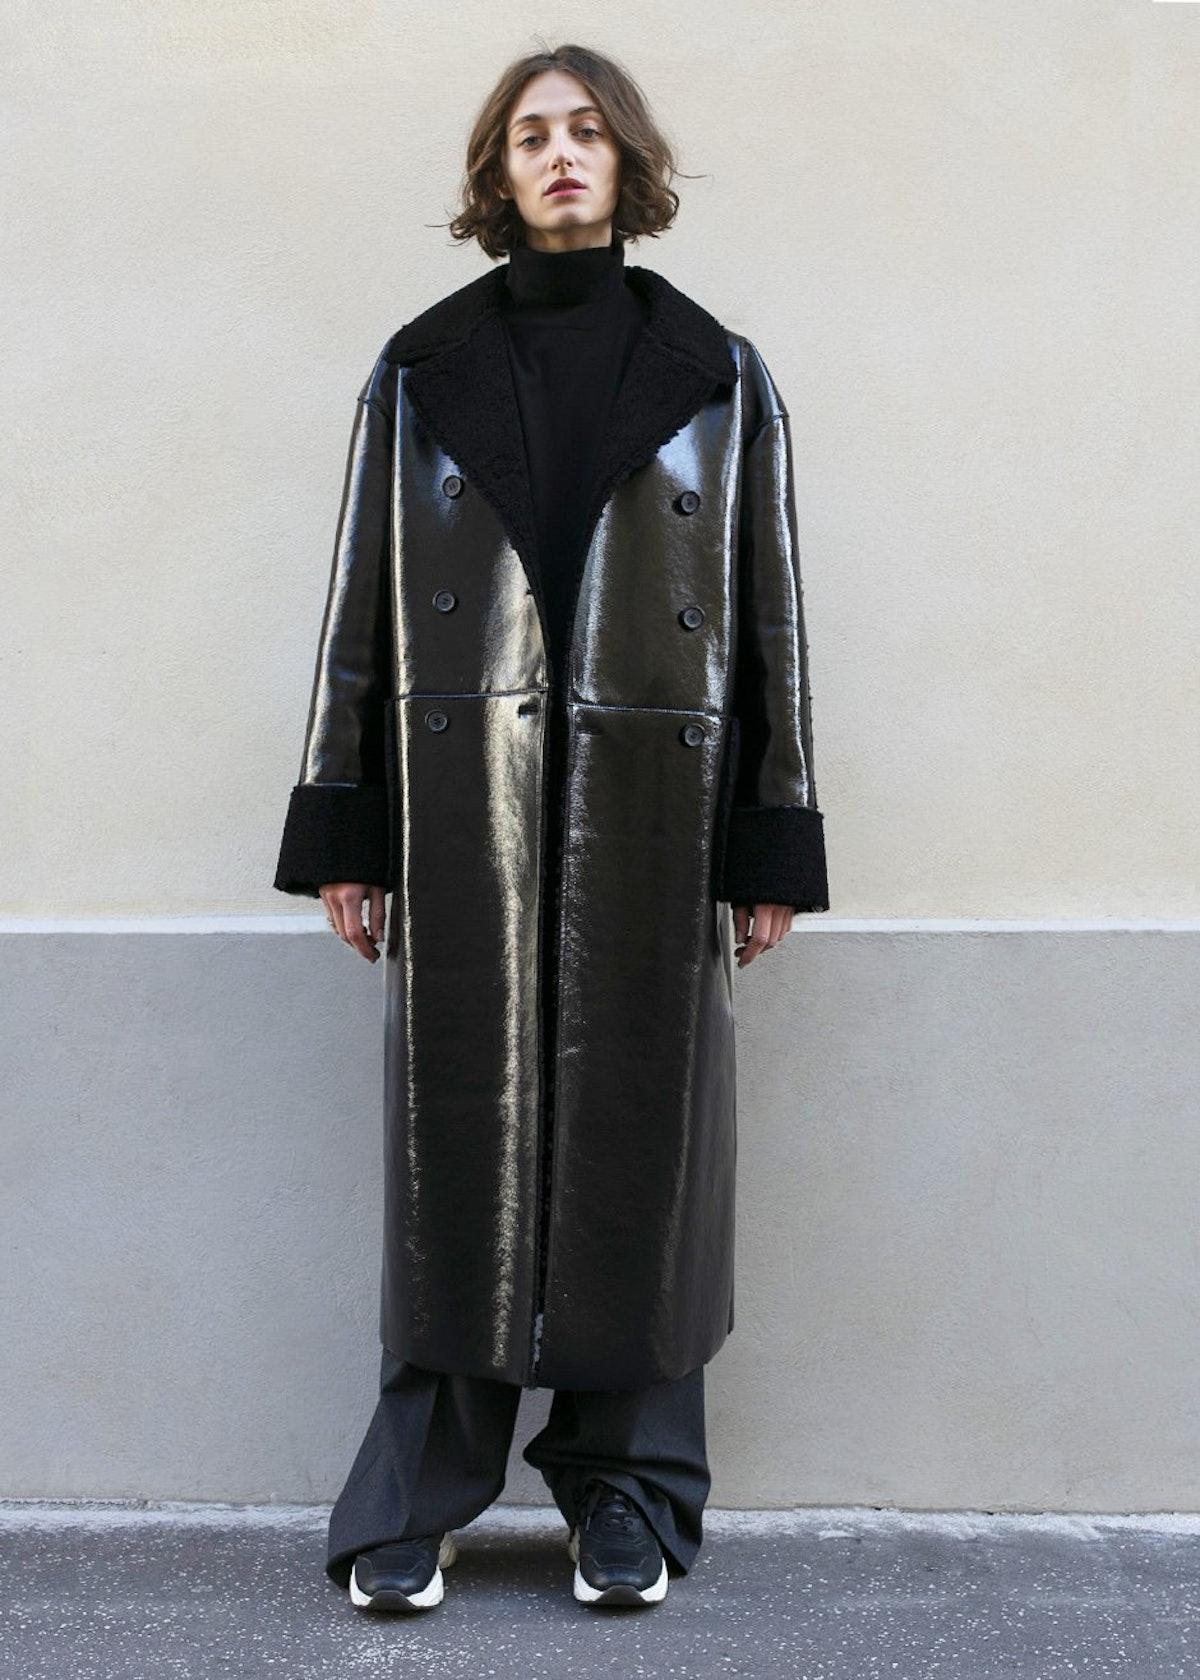 Black Patent Shearling Coat